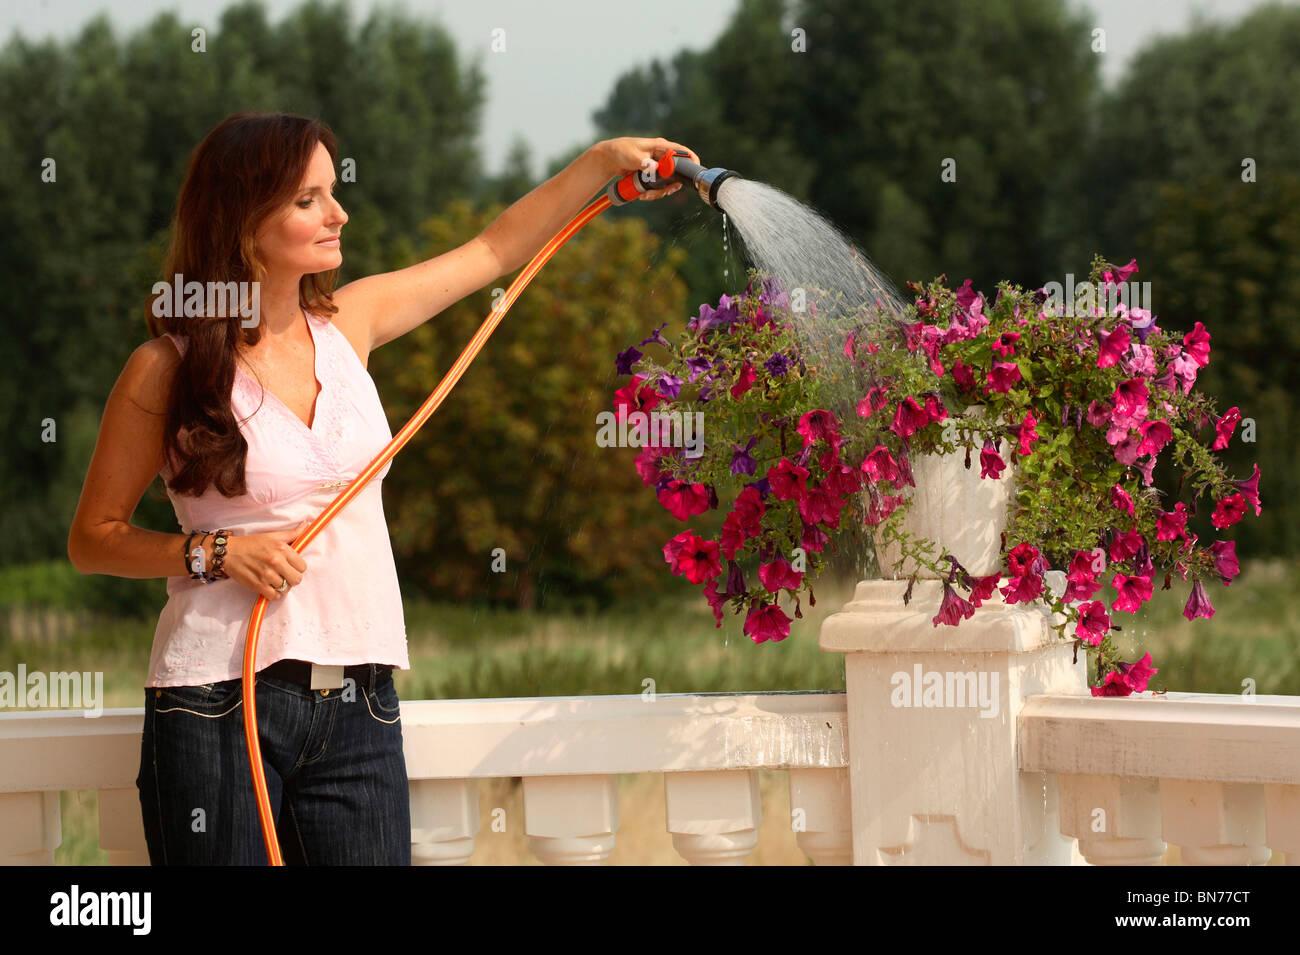 Woman watering Petunia - Stock Image